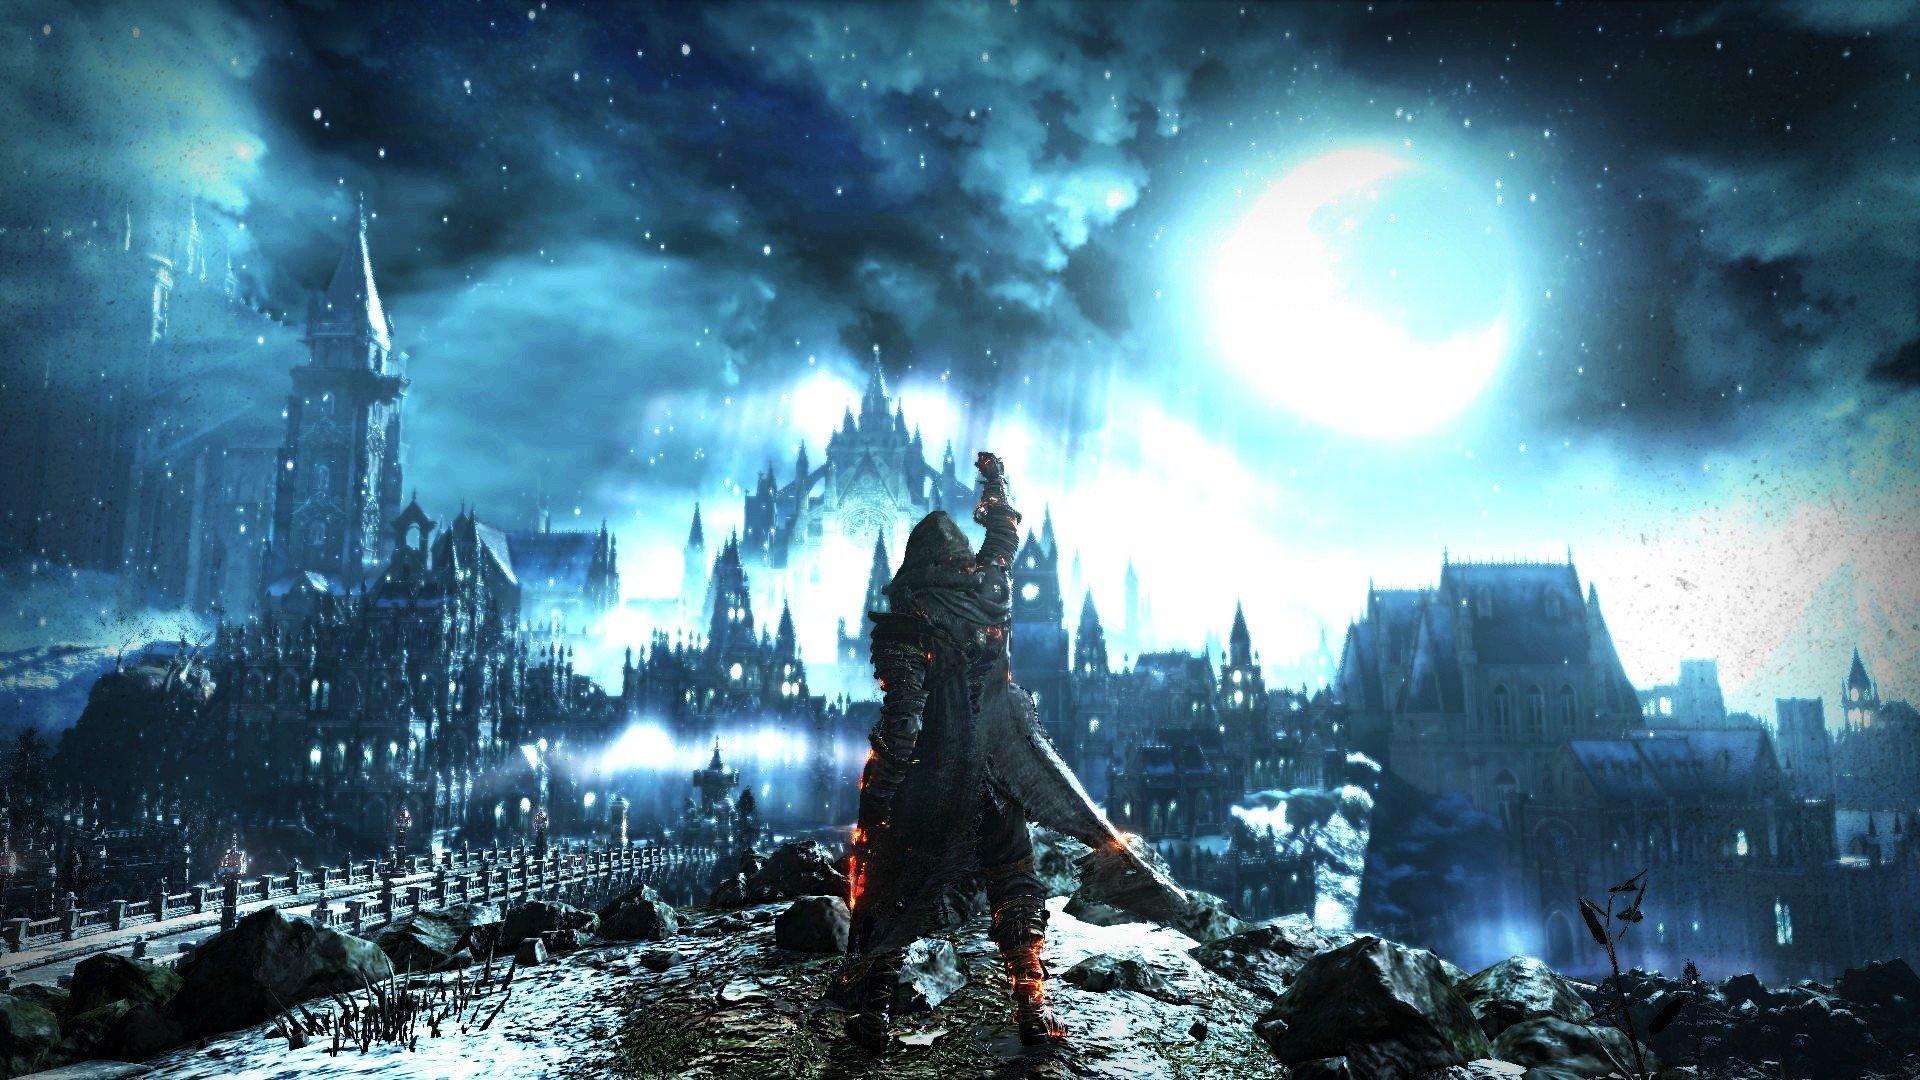 224 Dark Souls III HD Обои  Фоны  Wallpaper Abyss